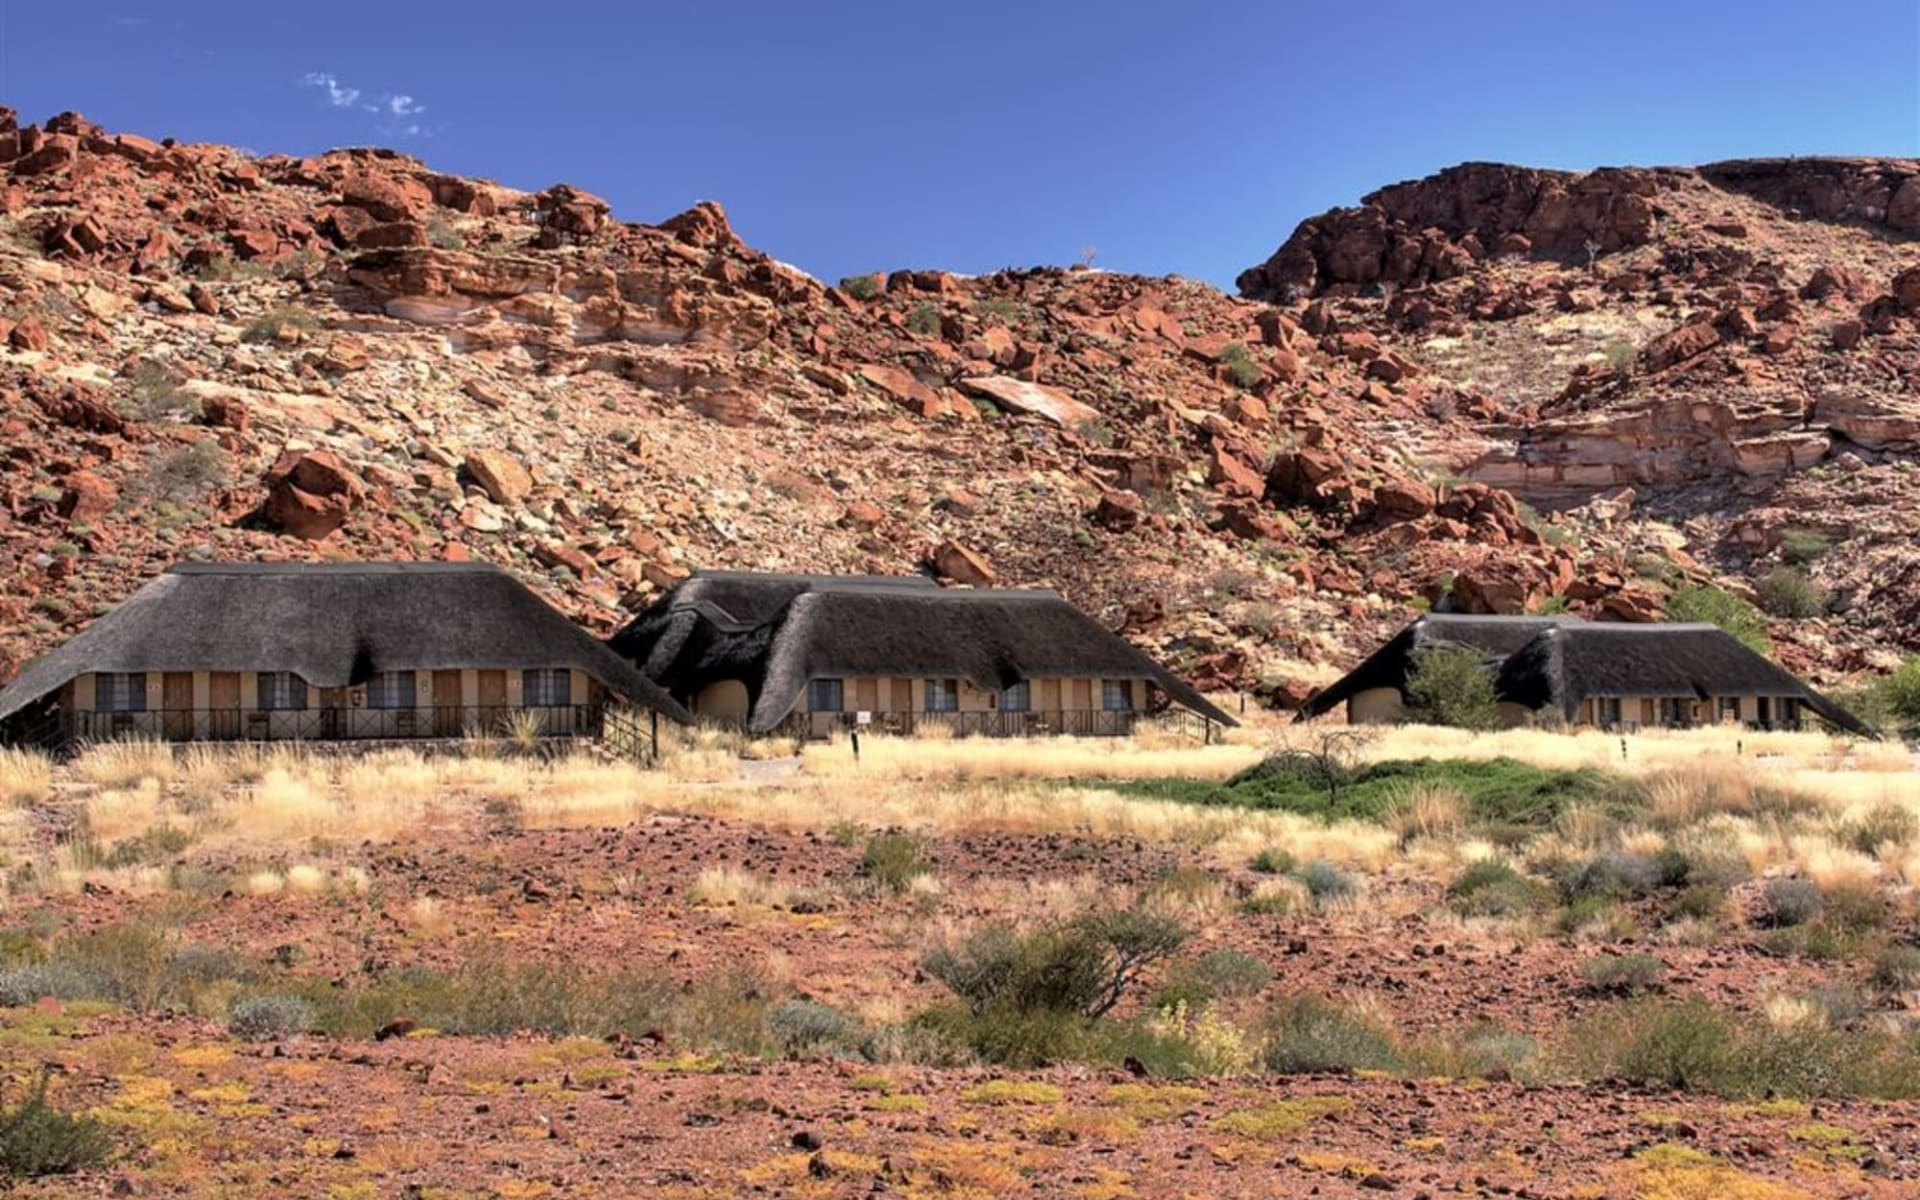 Twyfelfontein Country Lodge in Twyfelfontein Region: 09_150_2_Twyfelfontein Country Lodge